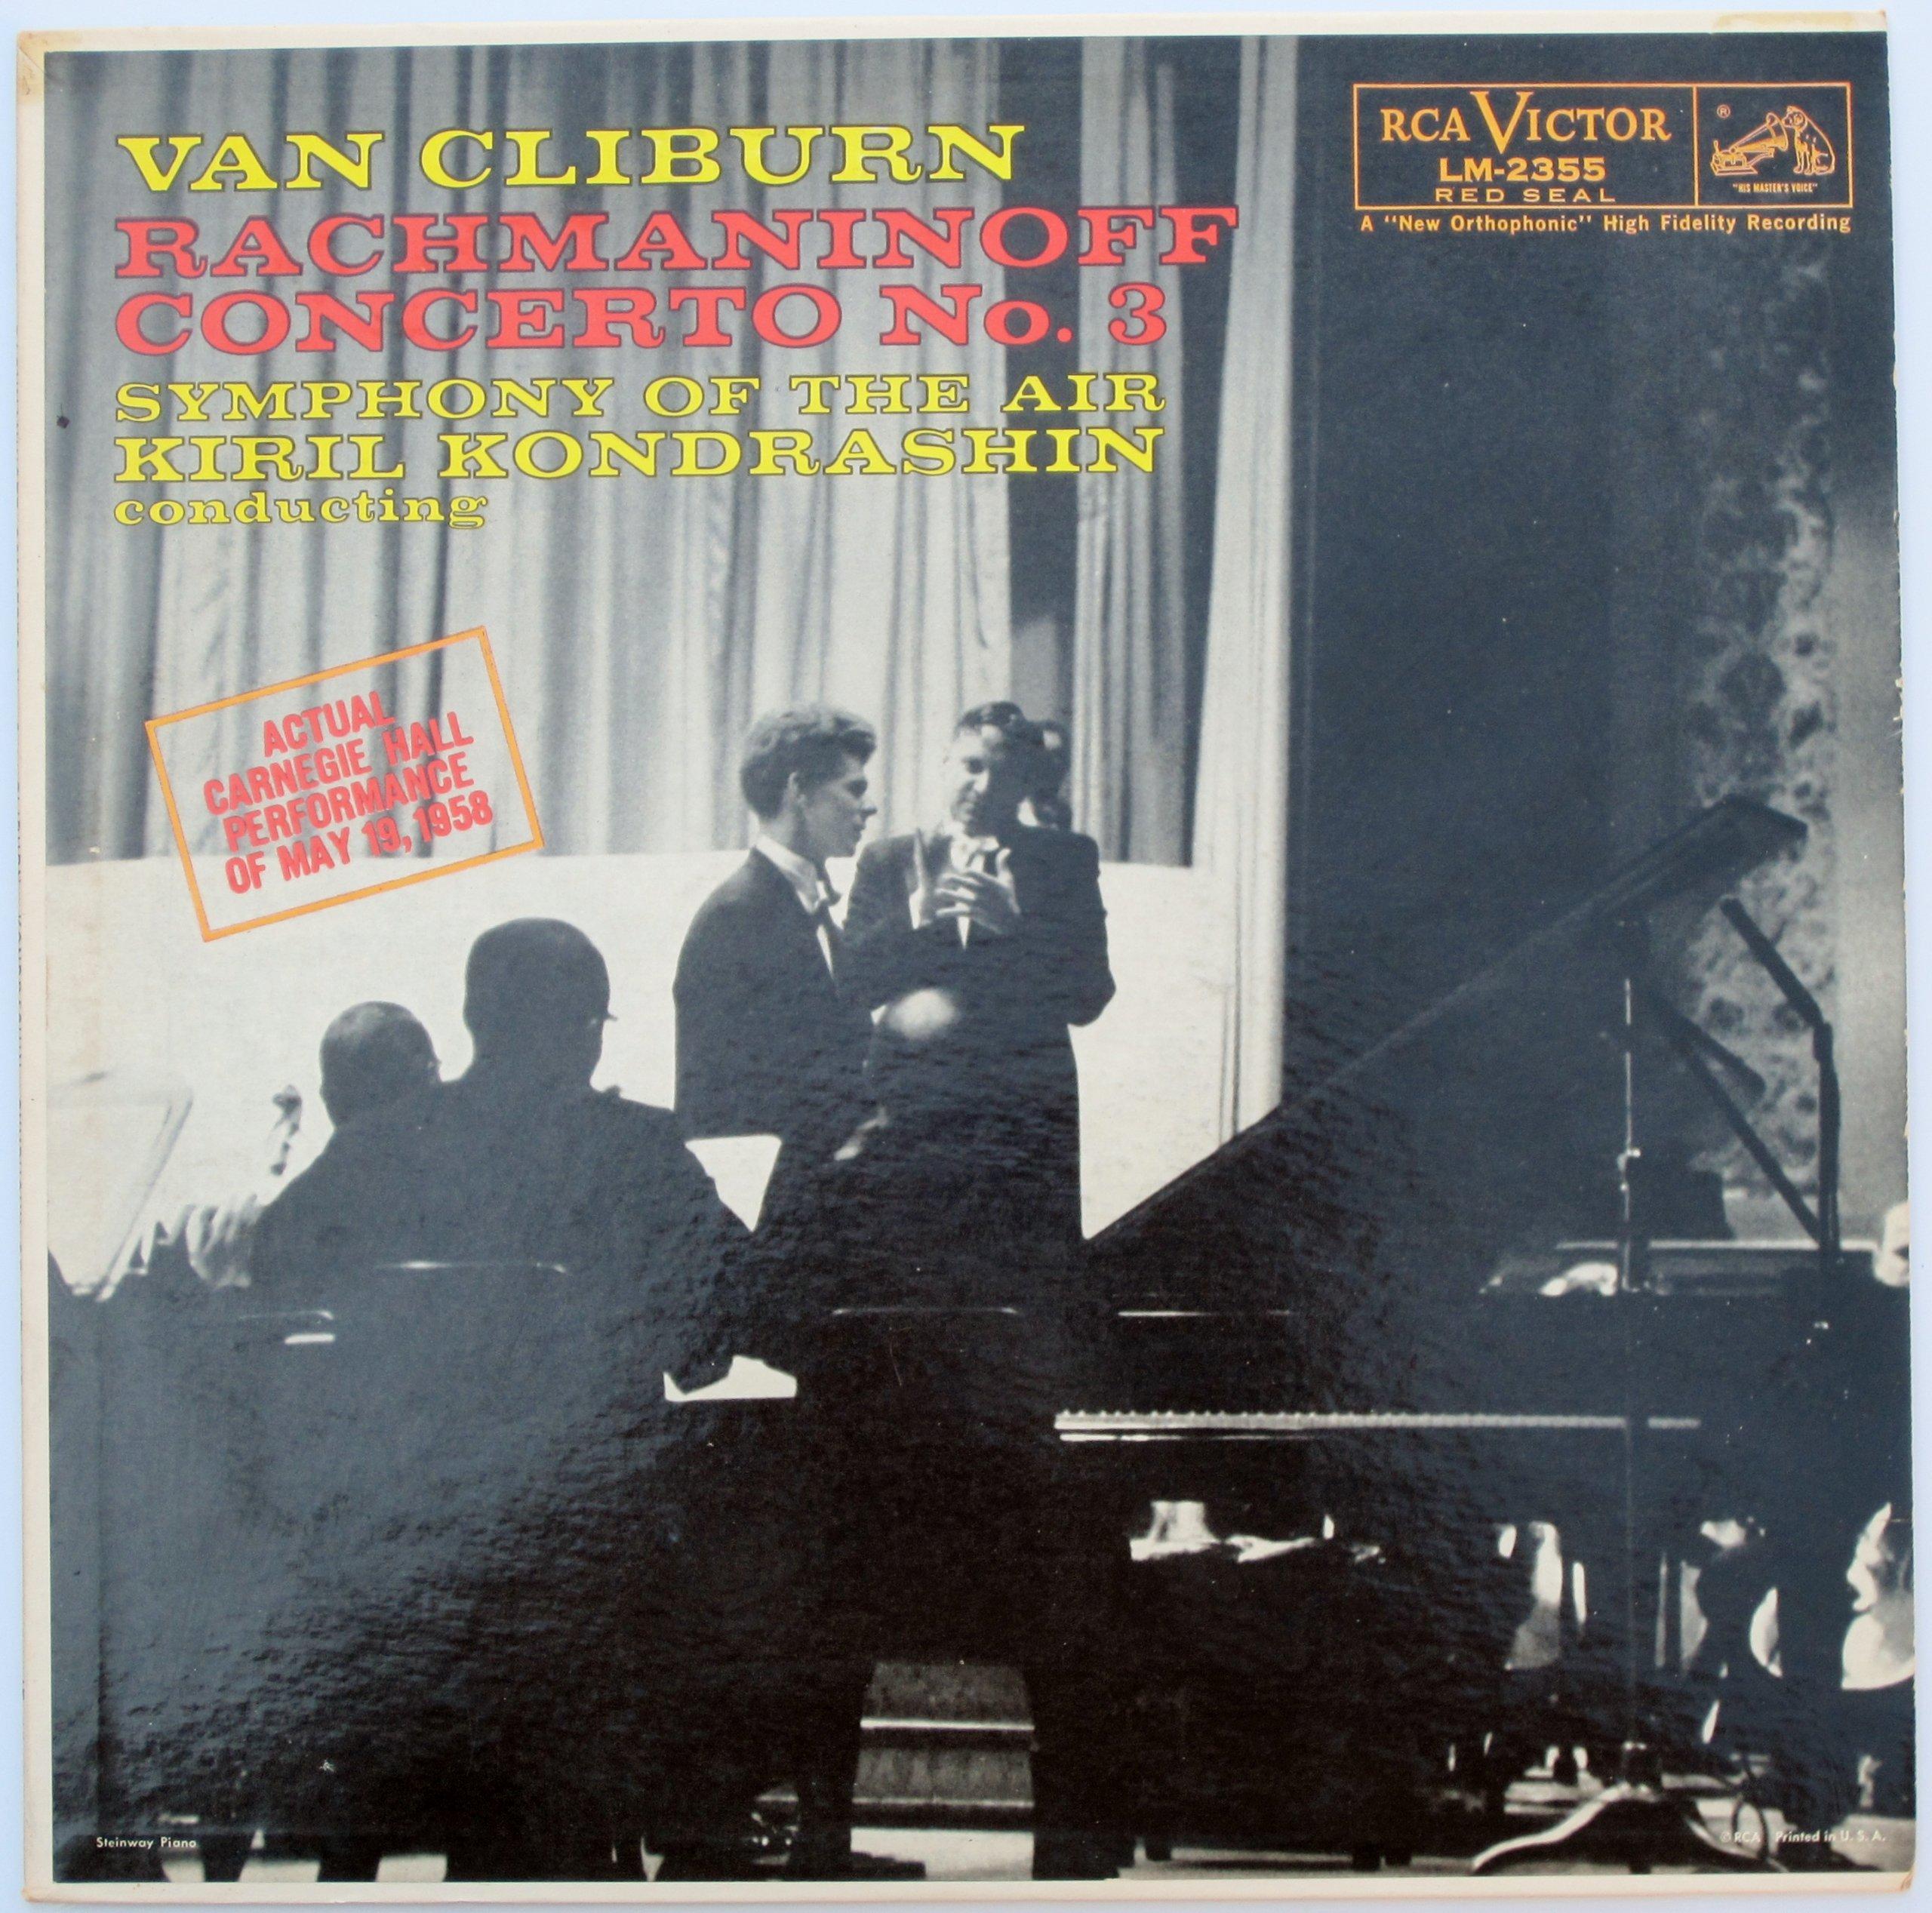 Rachmaninoff: Concerto No. 3 ''Symphony of the Air'' / Van Cliburn, Kiril Kondrashin, Conducting by RCA Victor Red Seal